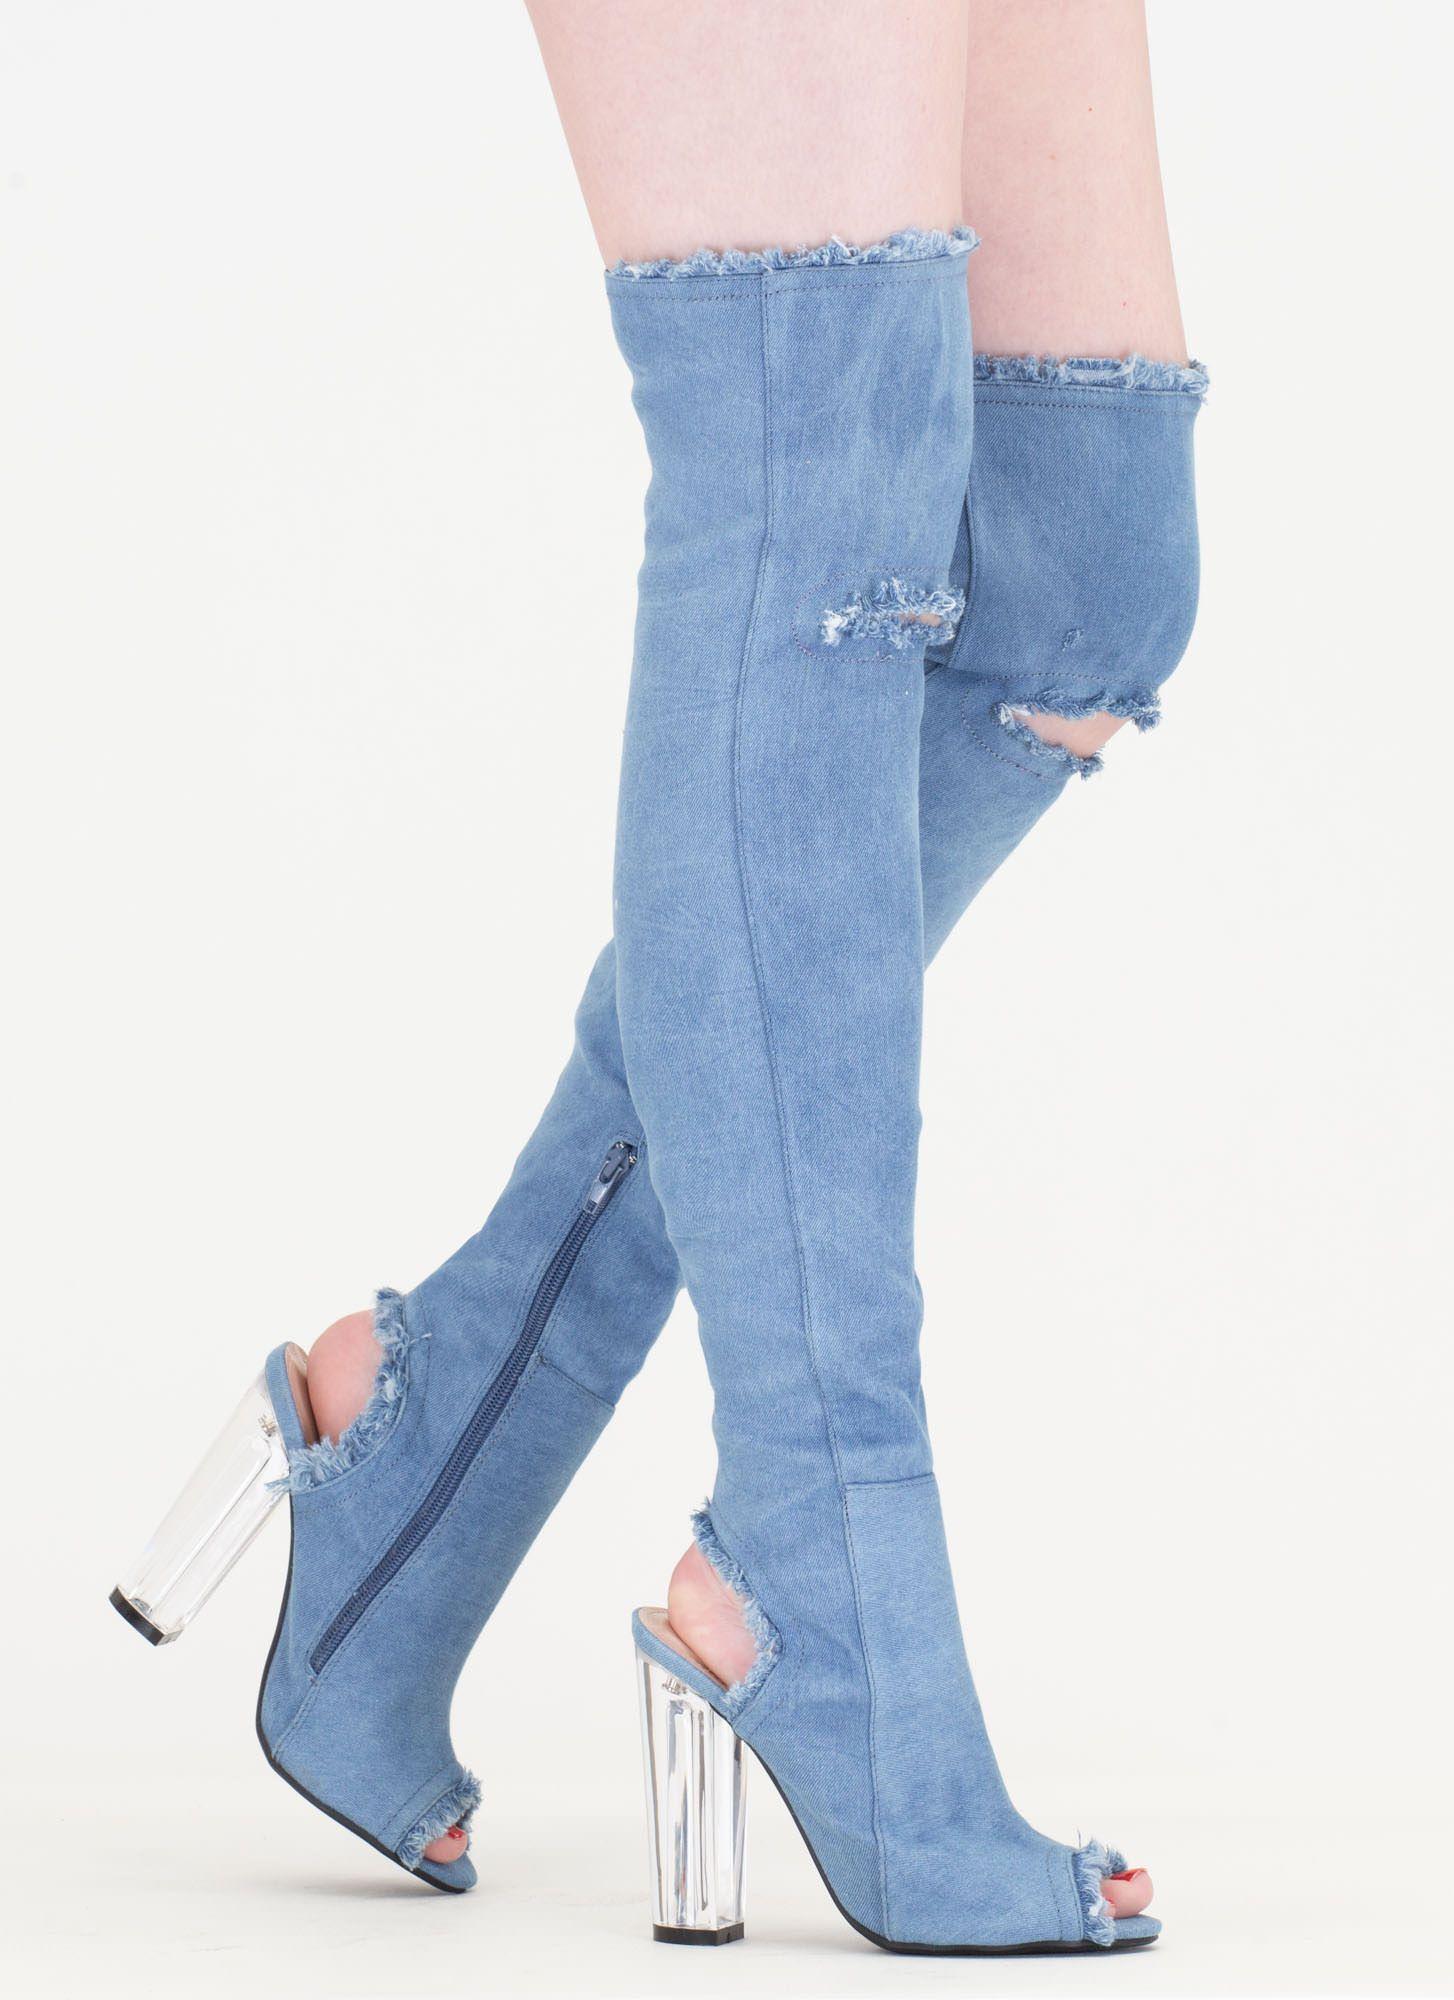 32aa9e3c6810 Clear Idea Chunky Denim Thigh-High Boots BLUE